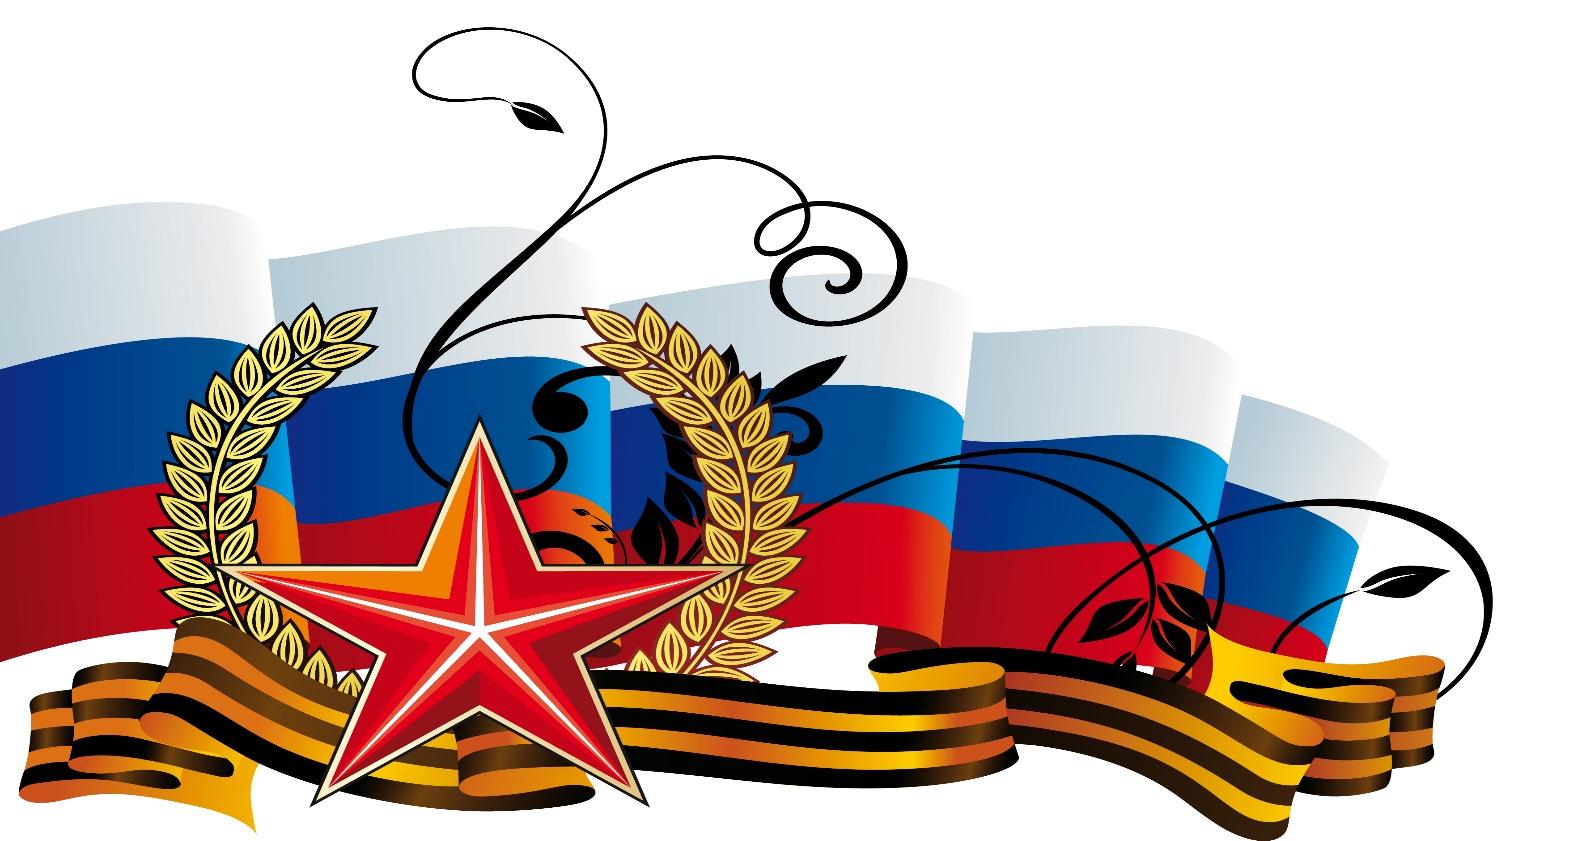 http://atvmedia.ru/assets/atvstavropol/media/afisha_site/%D0%9E%D1%82%D0%B5%D1%87%D0%B5%D1%81%D1%82%D0%B2%D0%BE.%D0%9C%D1%83%D0%B6%D0%B5%D1%81%D1%82%D0%B2%D0%BE.jpg